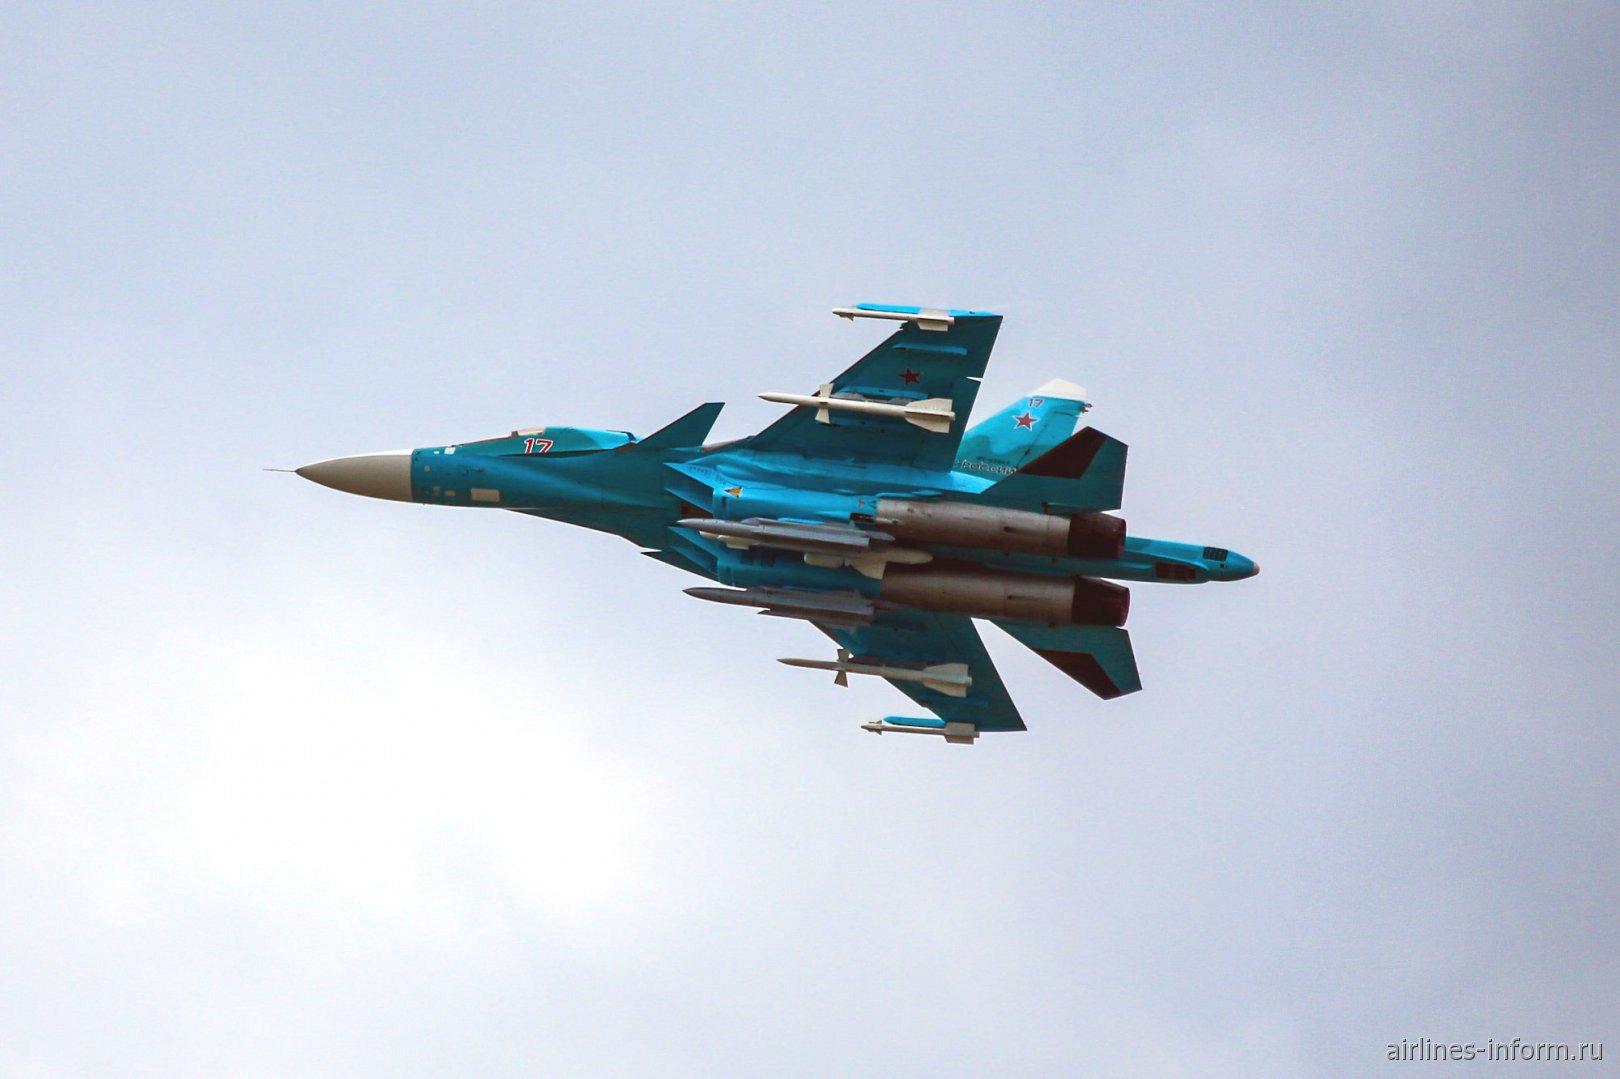 Бомбардировщик Су-34 в полете на авиасалоне МАКС-2017